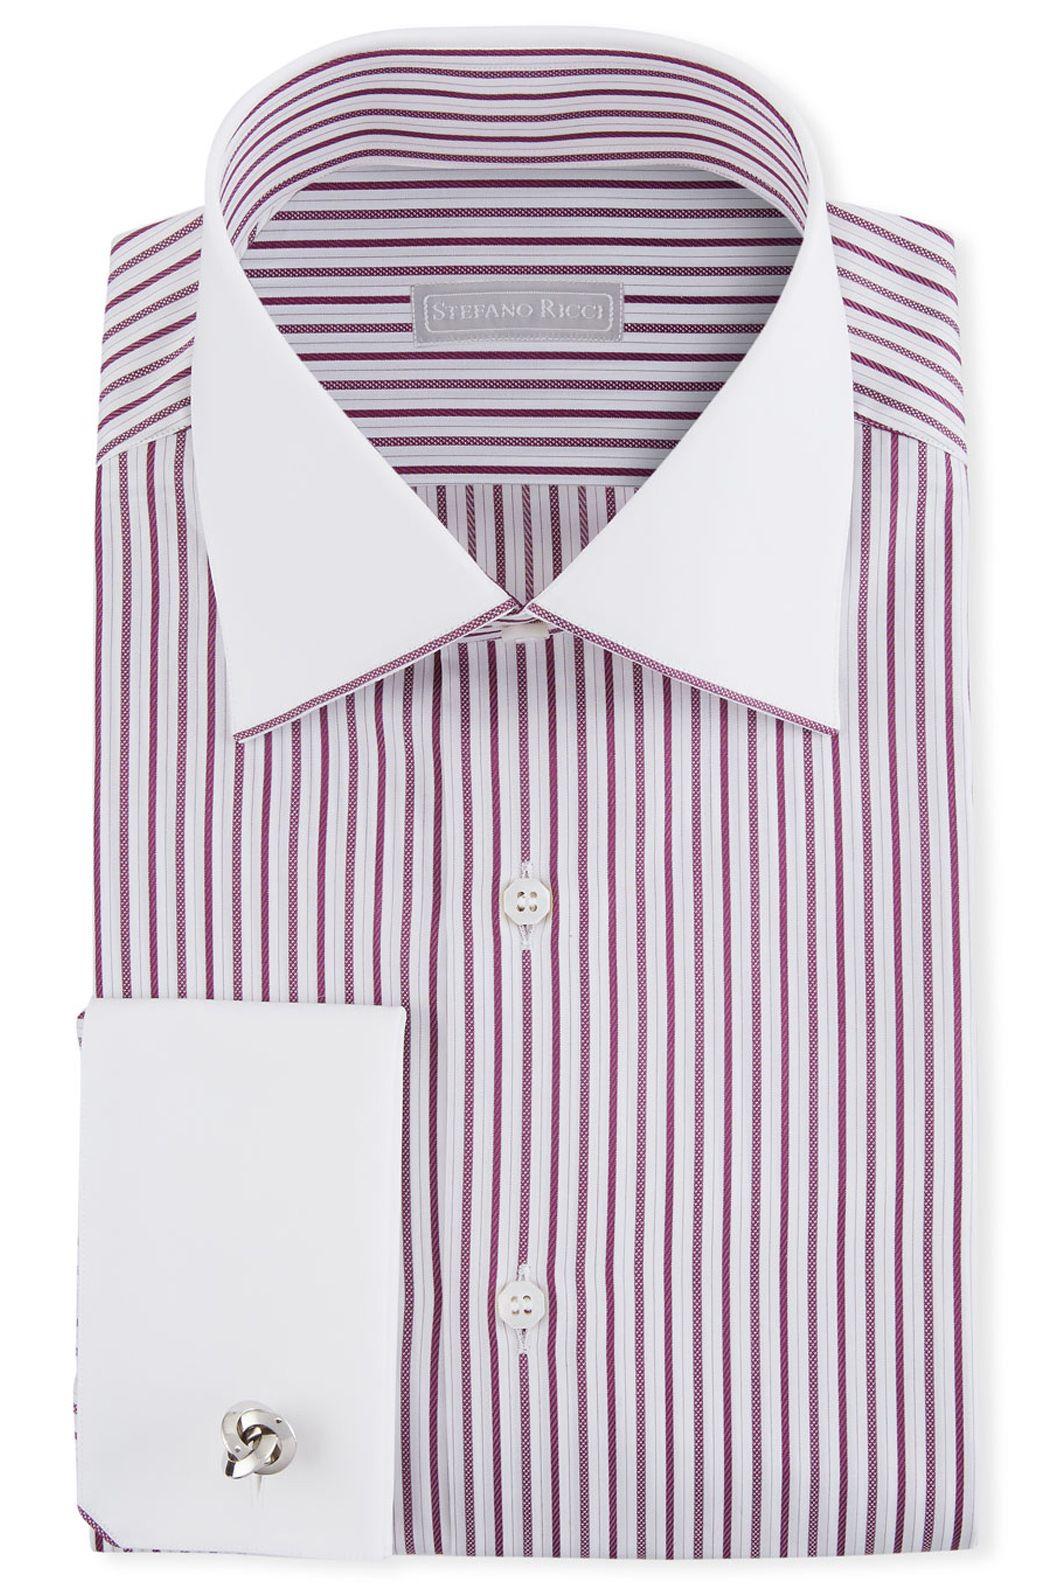 Stefano Ricci Men S Contrast Collar Cuff Striped Dress Shirt Mens Shirt Dress Shirt Dress Navy Blue Dress Shirt [ 1592 x 1056 Pixel ]